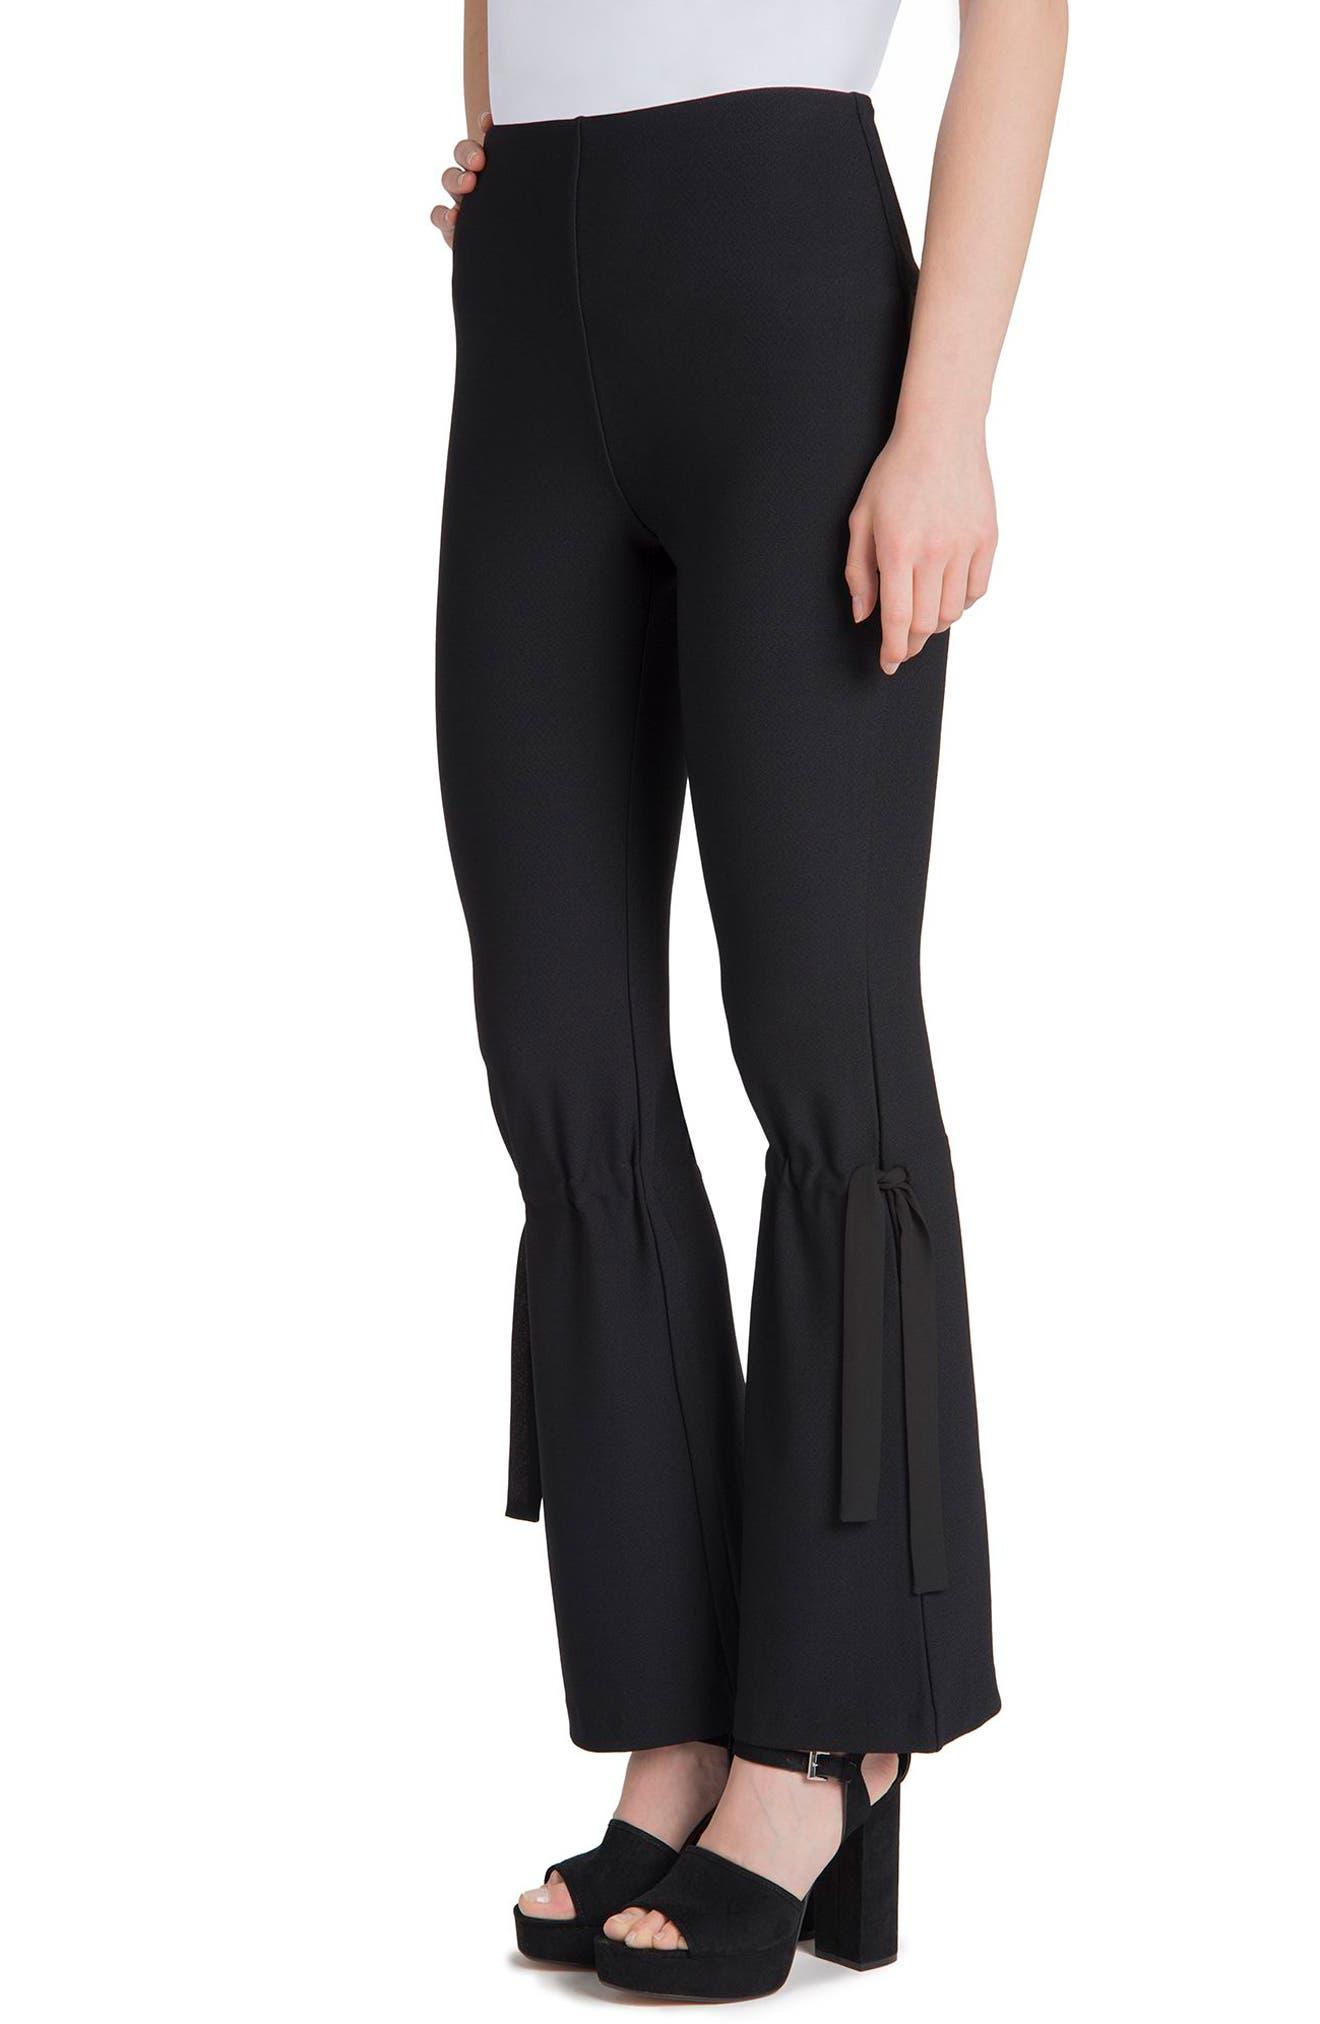 Arcadia High Waist Pants,                             Alternate thumbnail 3, color,                             Black